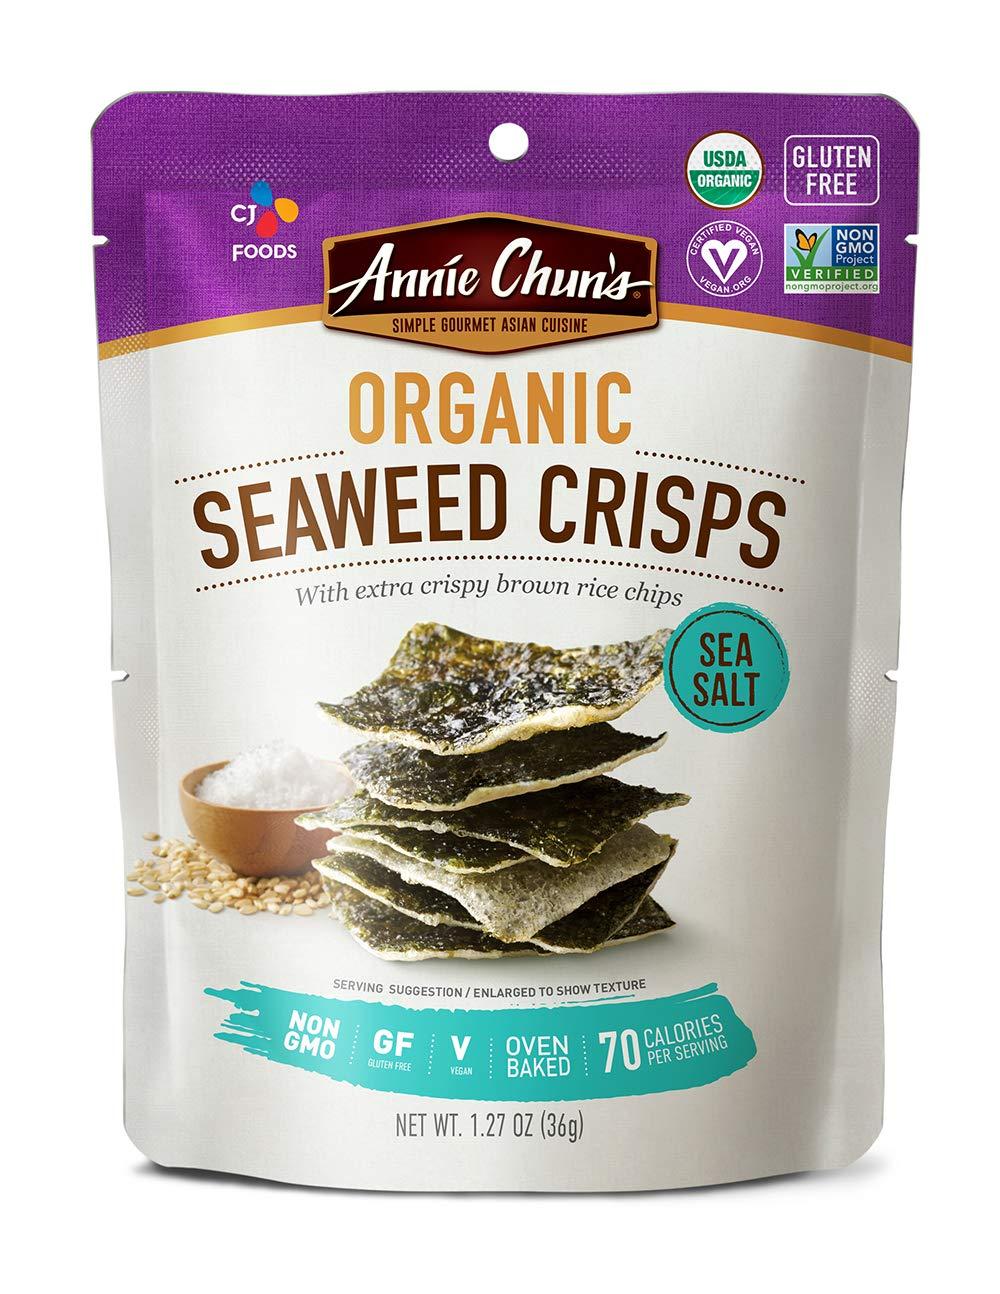 Annie Chun's Organic Seaweed Crisps, Sea Salt, Non-GMO, Gluten-Free, Oven-Baked, 1.27-Oz (Pack Of 10), Sea Salt, 10Count